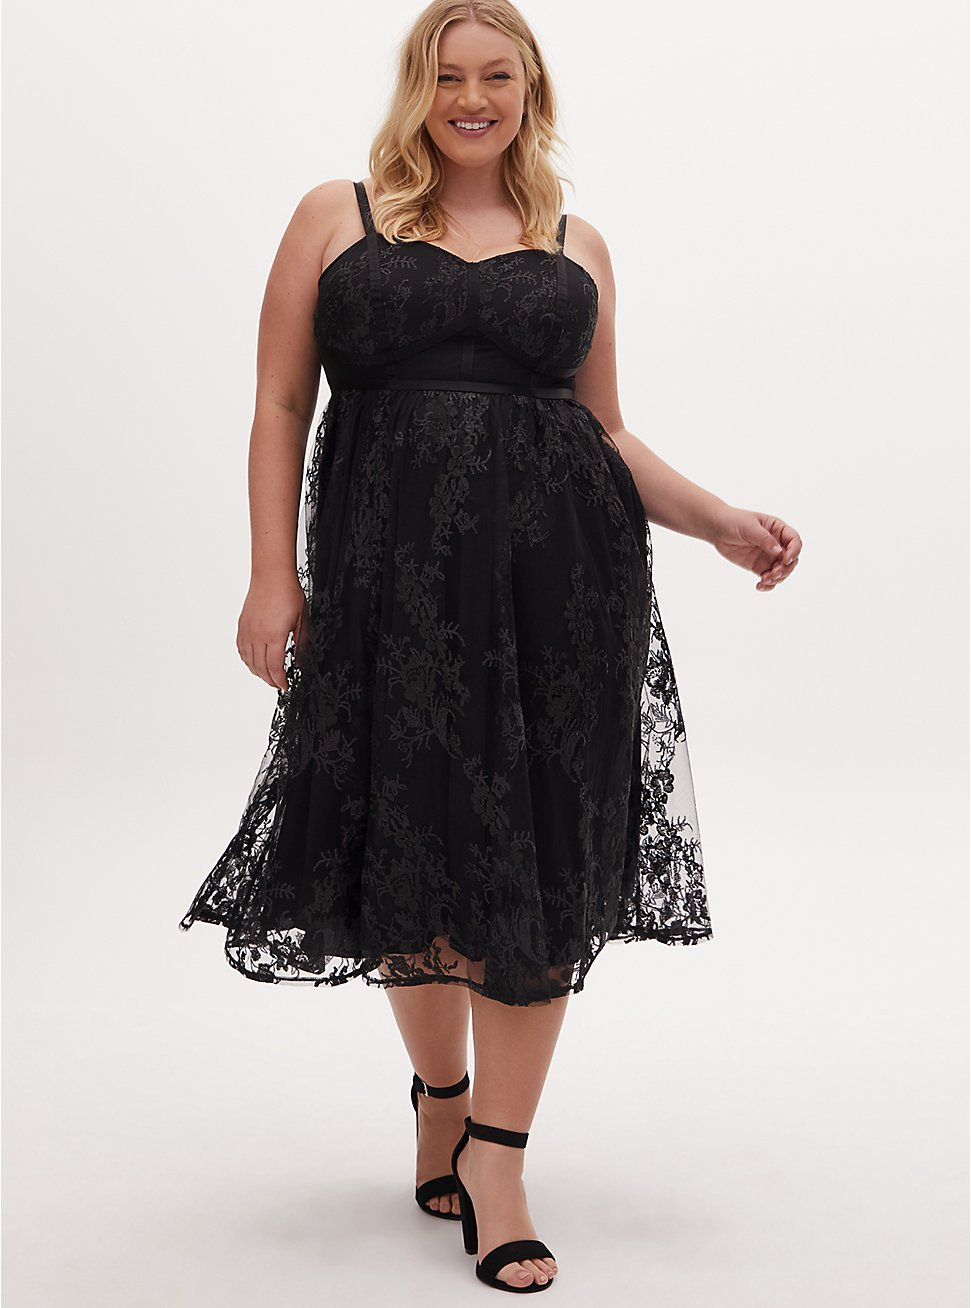 Plus Size Black & Pearl Sequin Embellished Mesh Sleeved